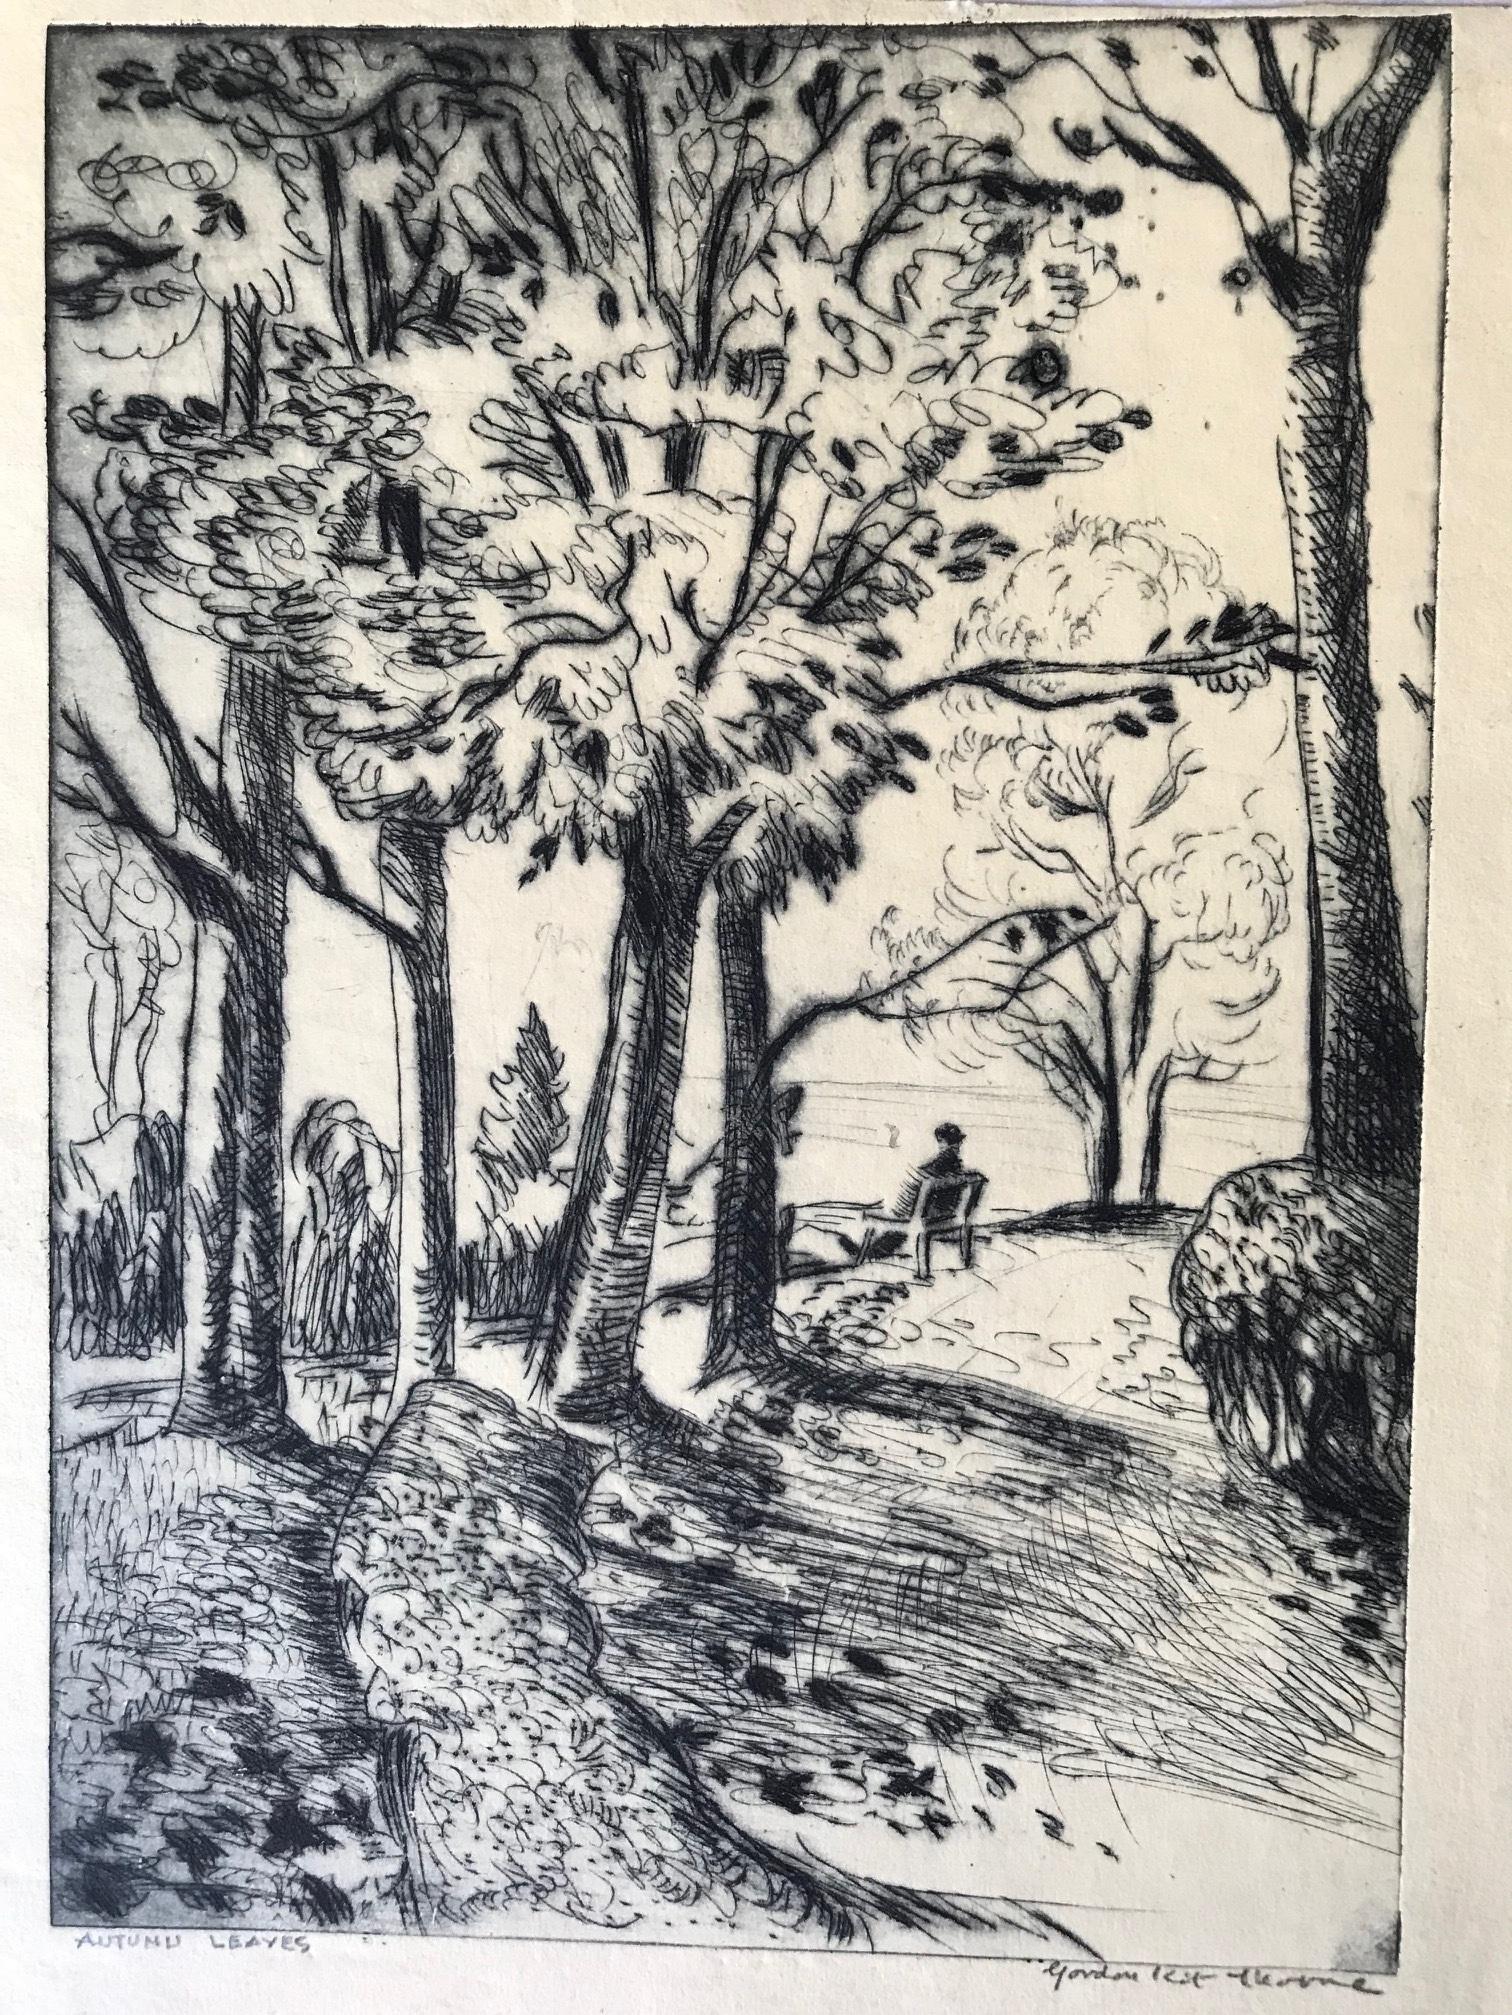 Gordon Kit Thorne, Autumn Leaves